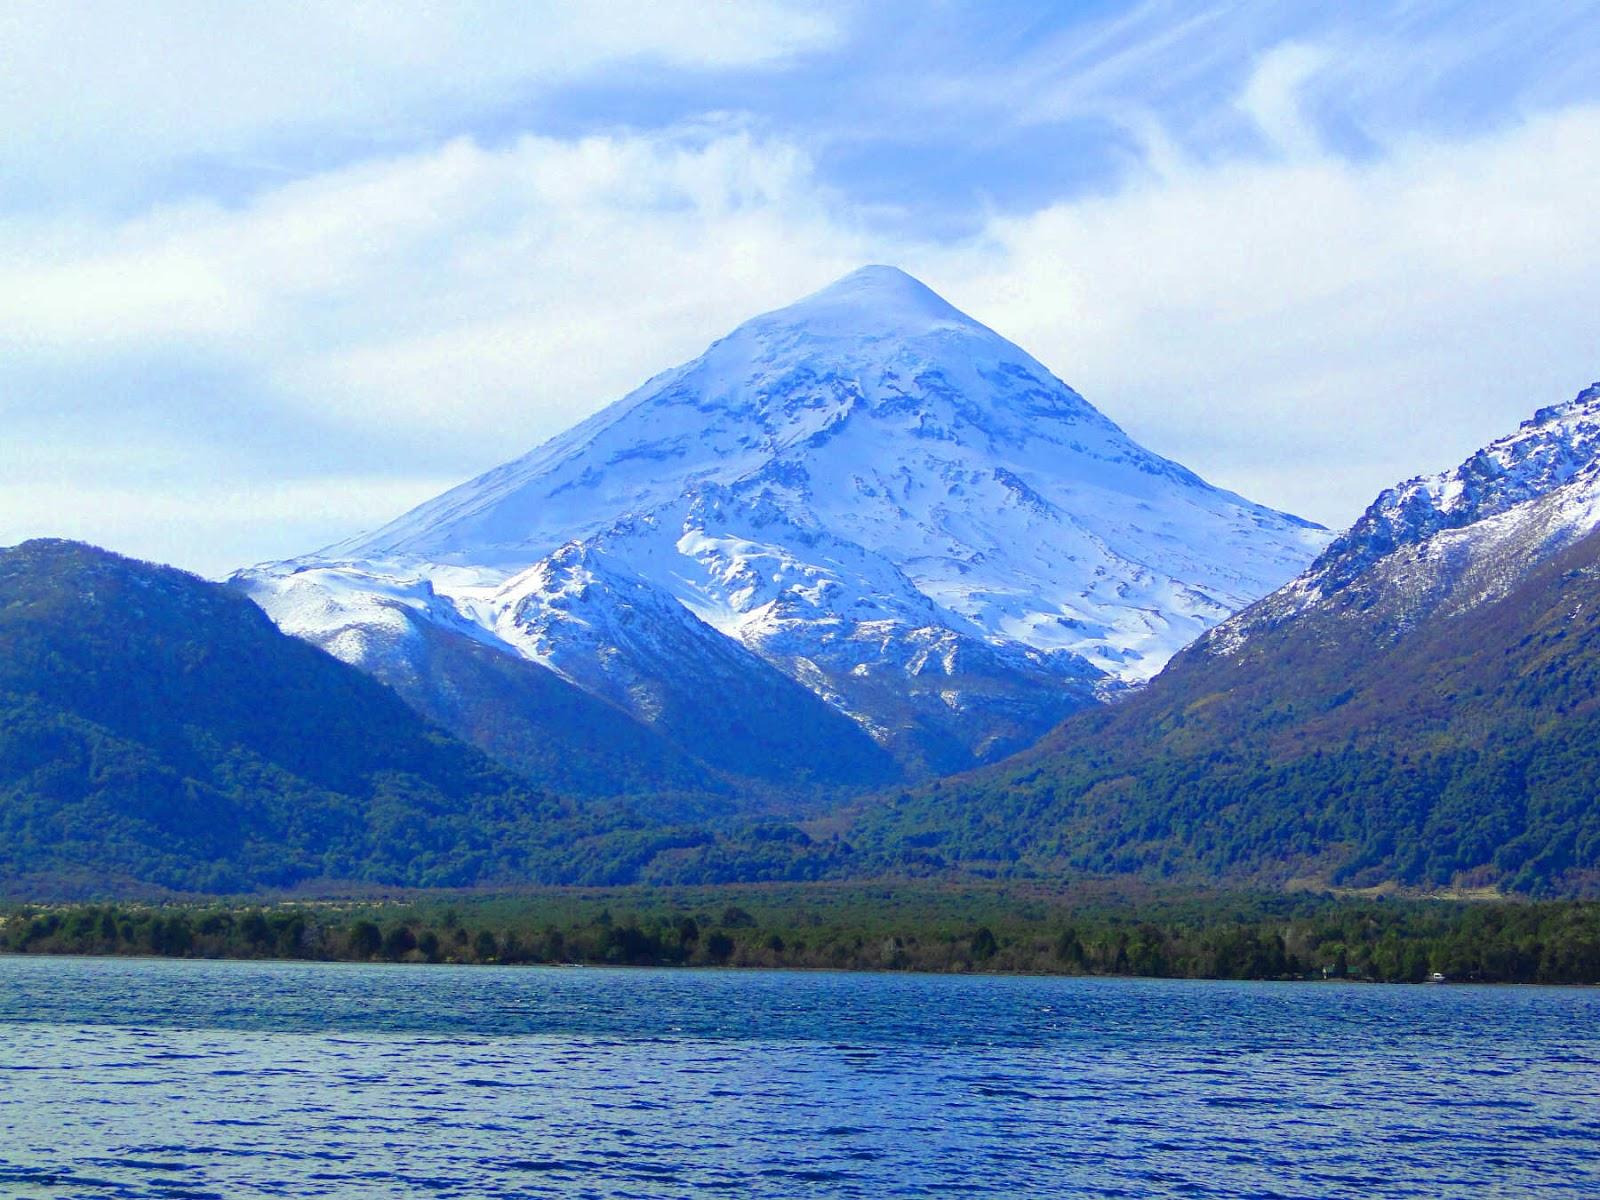 Lago Efulafquen e Vulcâo Lanin